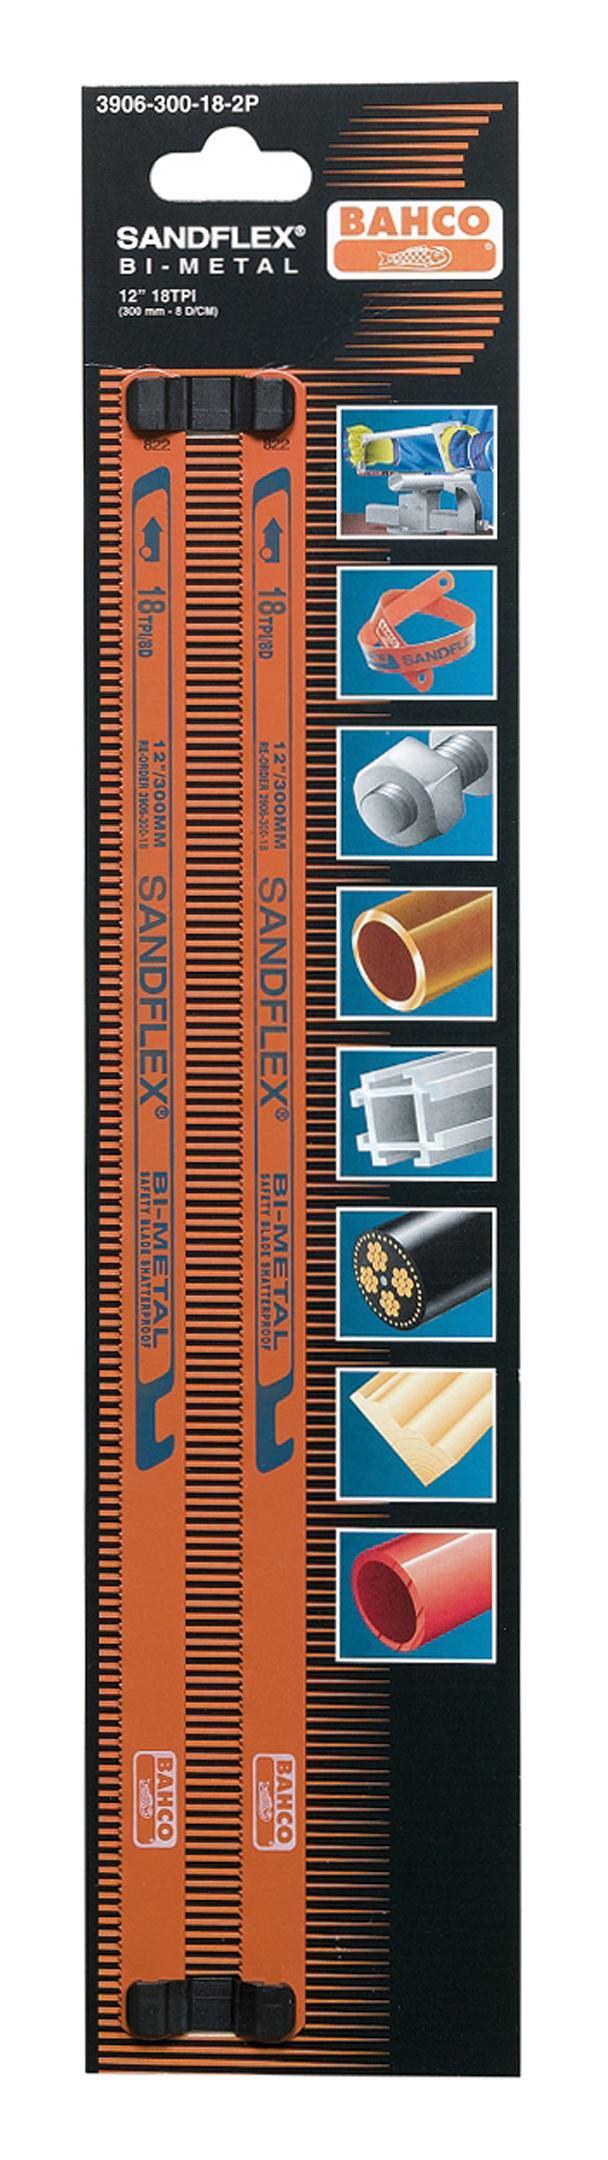 Bahco Metallsägeblatt 300 x 13 x 0,65mm 24 Zähne Kapmann 1707-300-24-100P